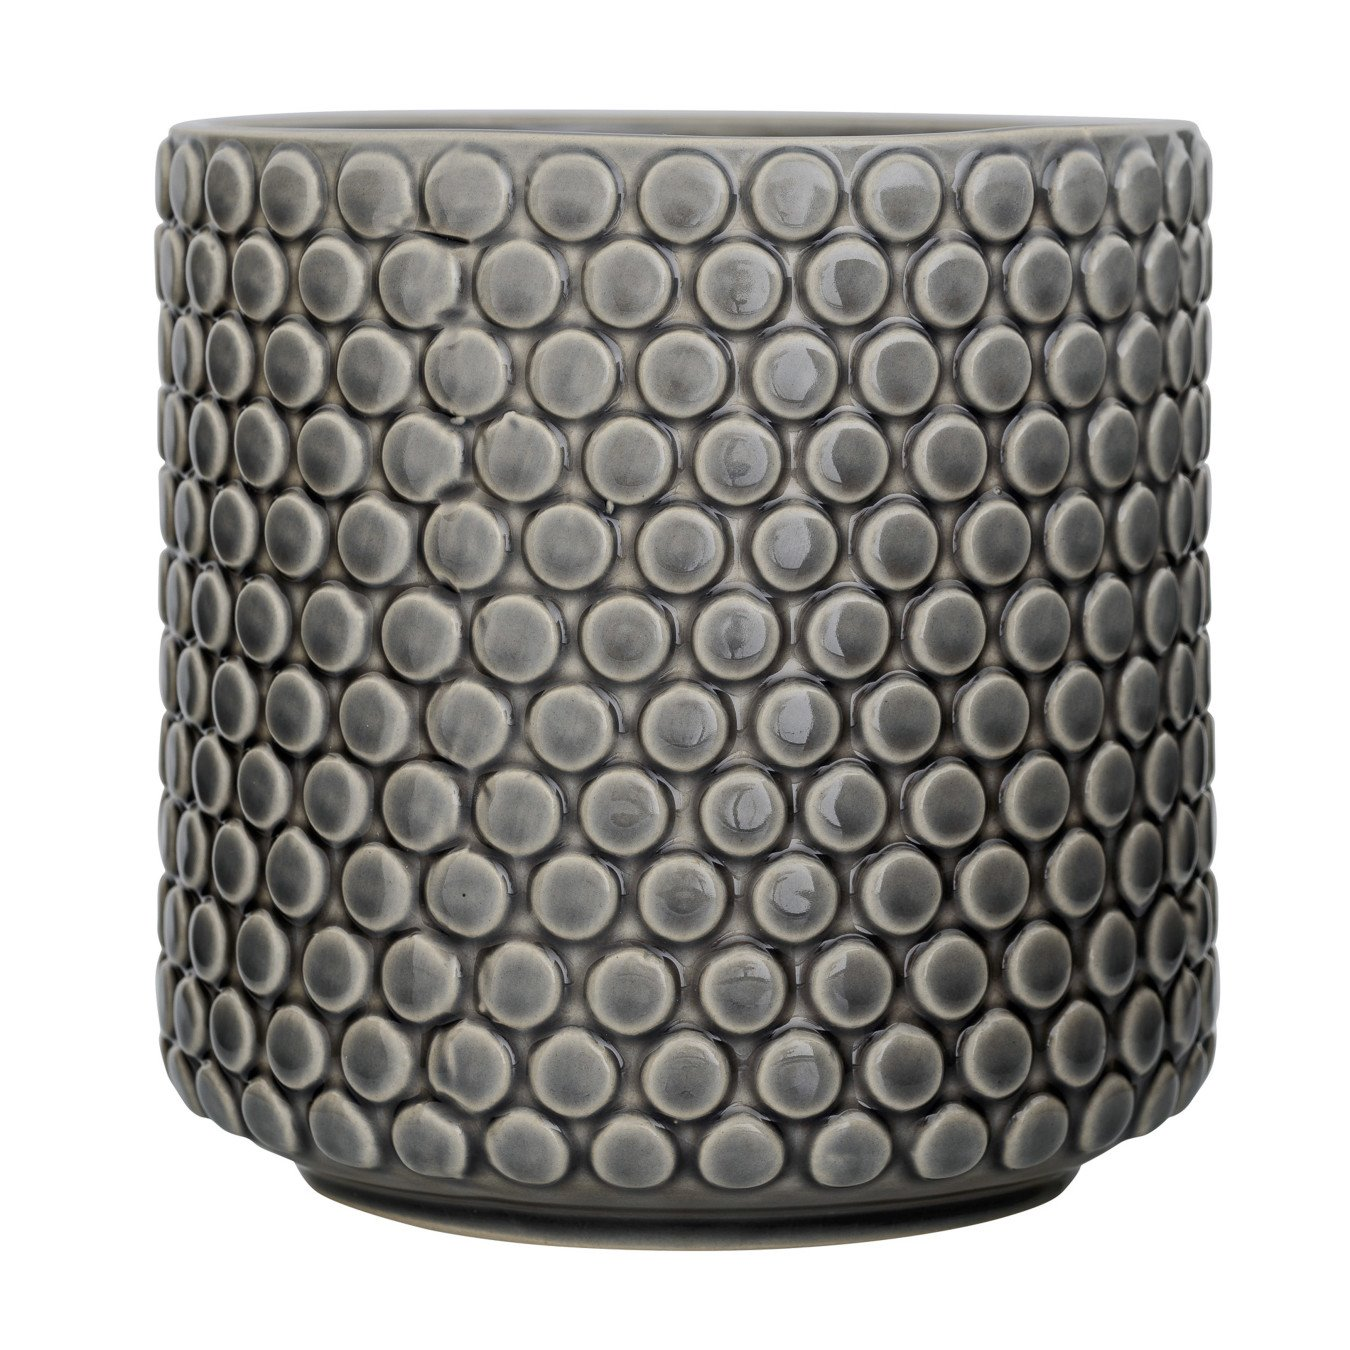 Grey Stoneware Flower Pot with Polka Dots